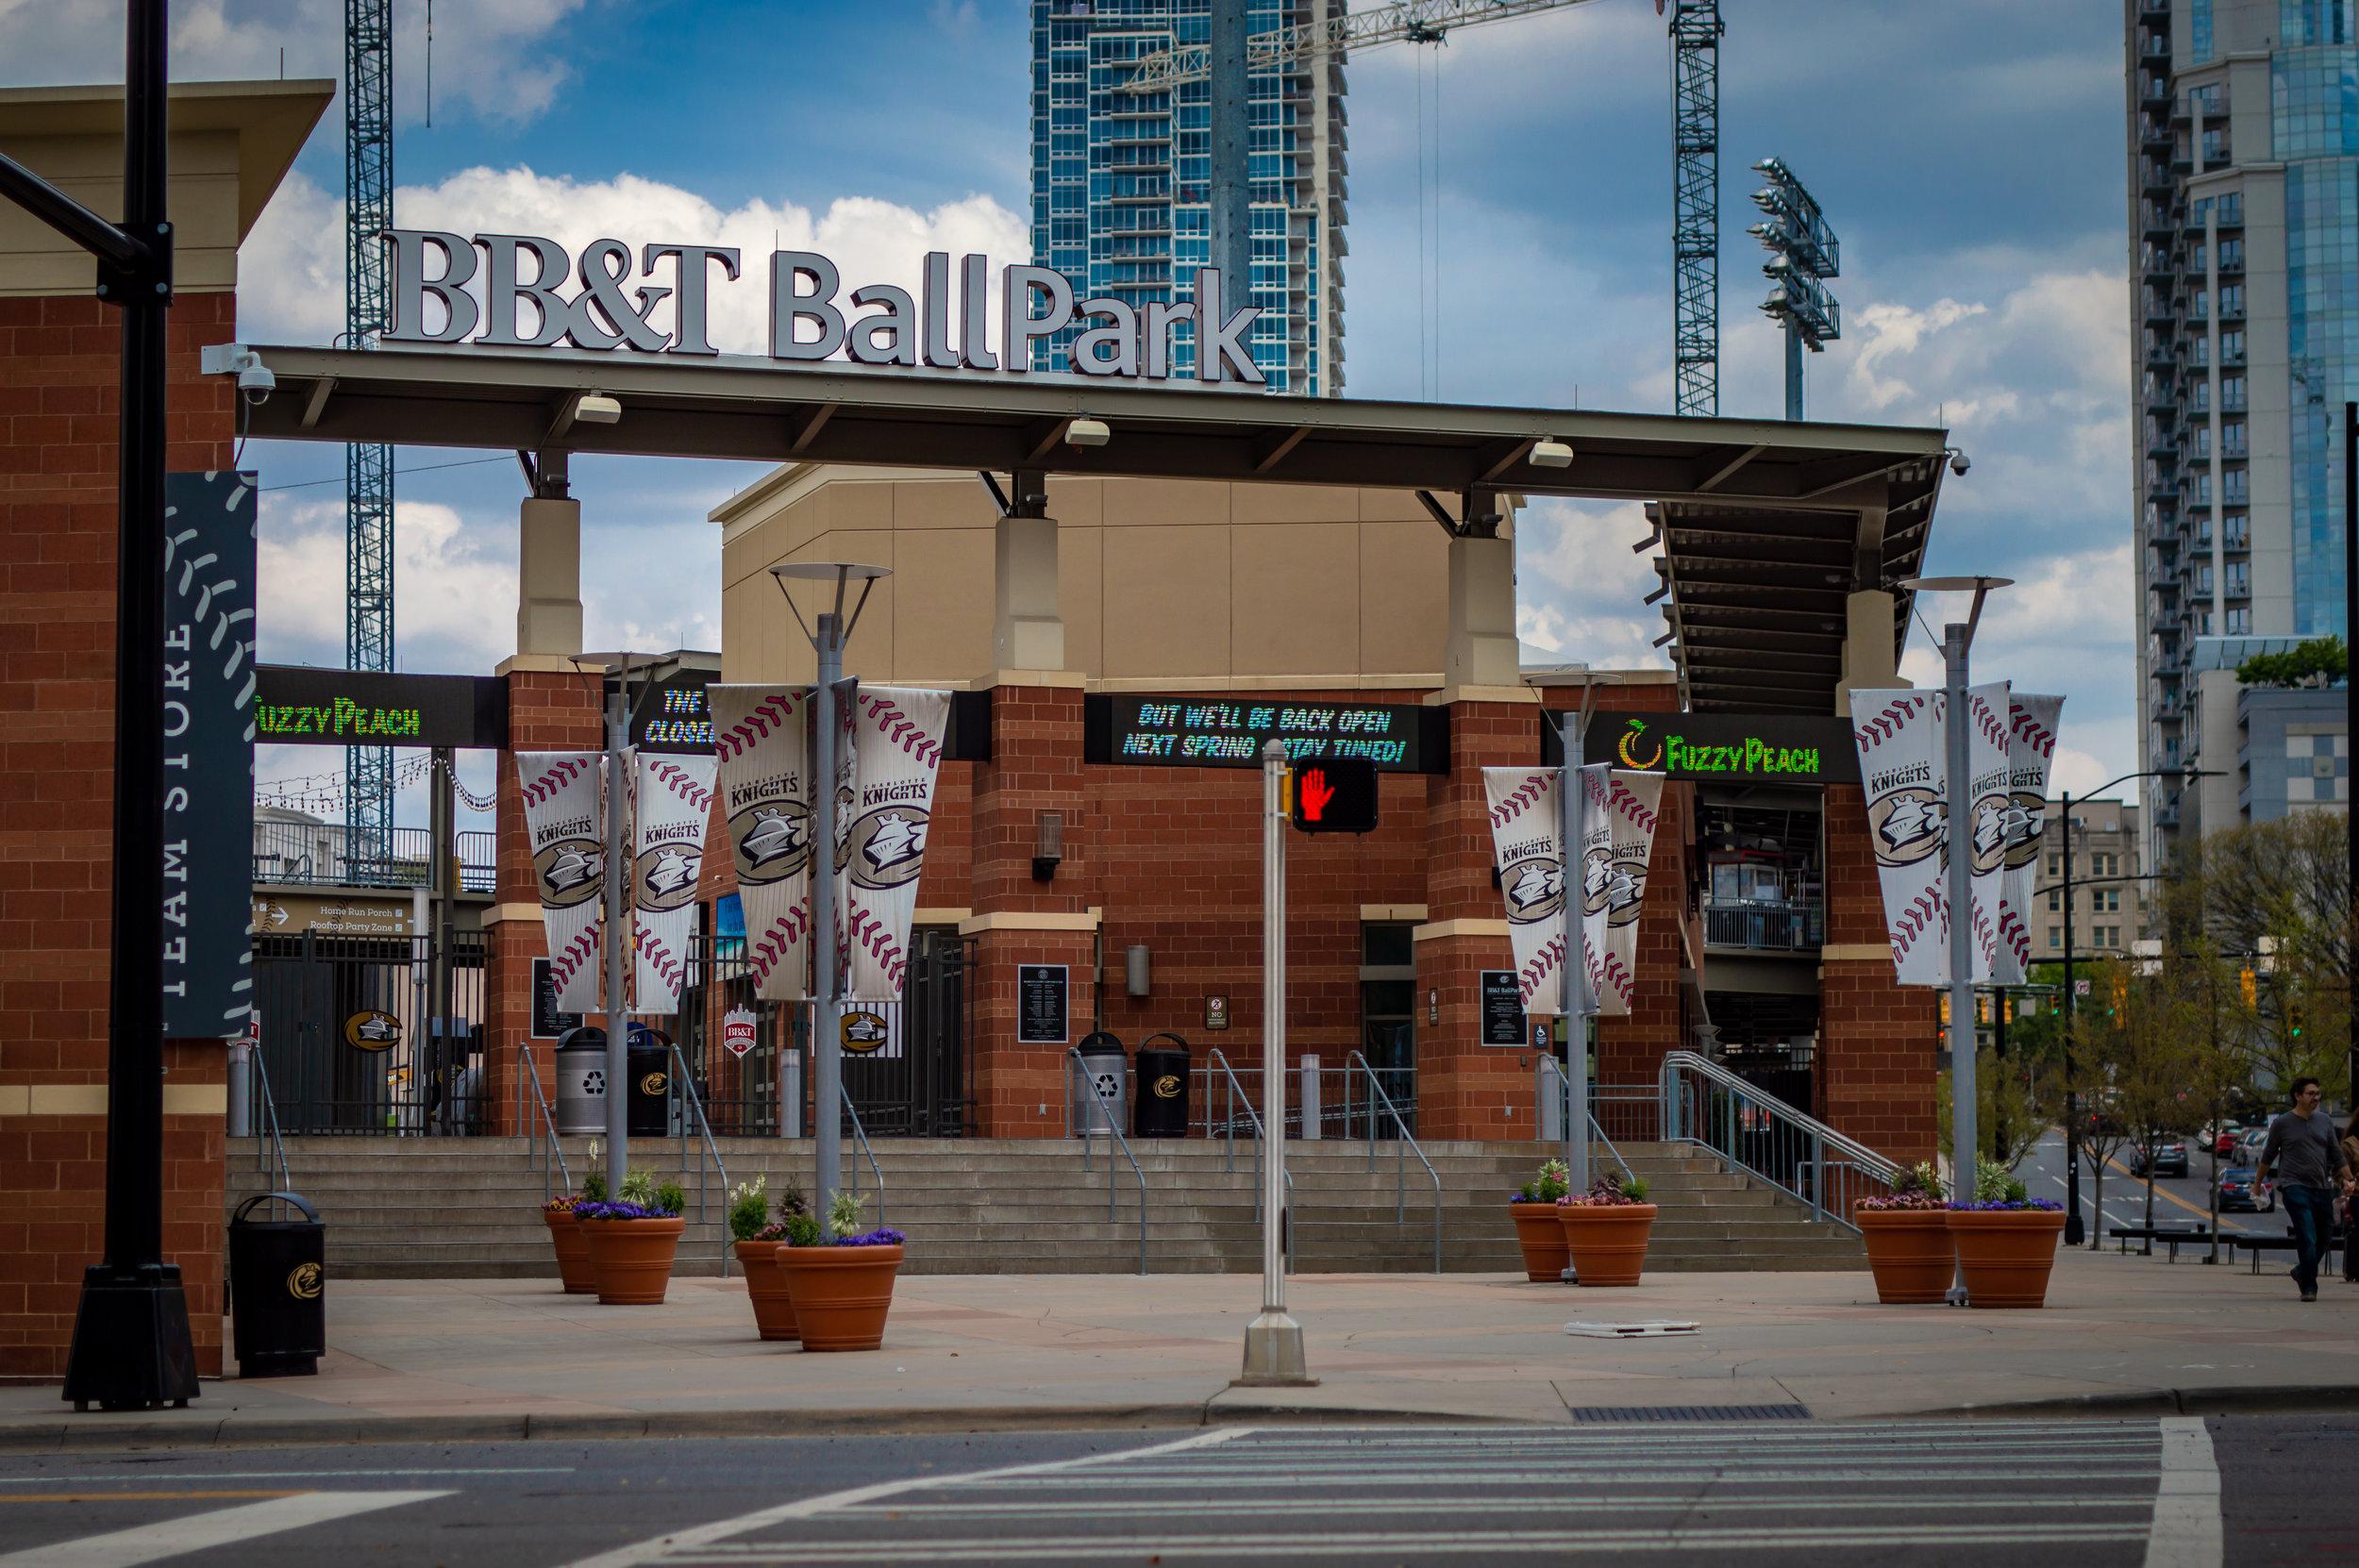 Charlotte Knights BB&T Ball Park